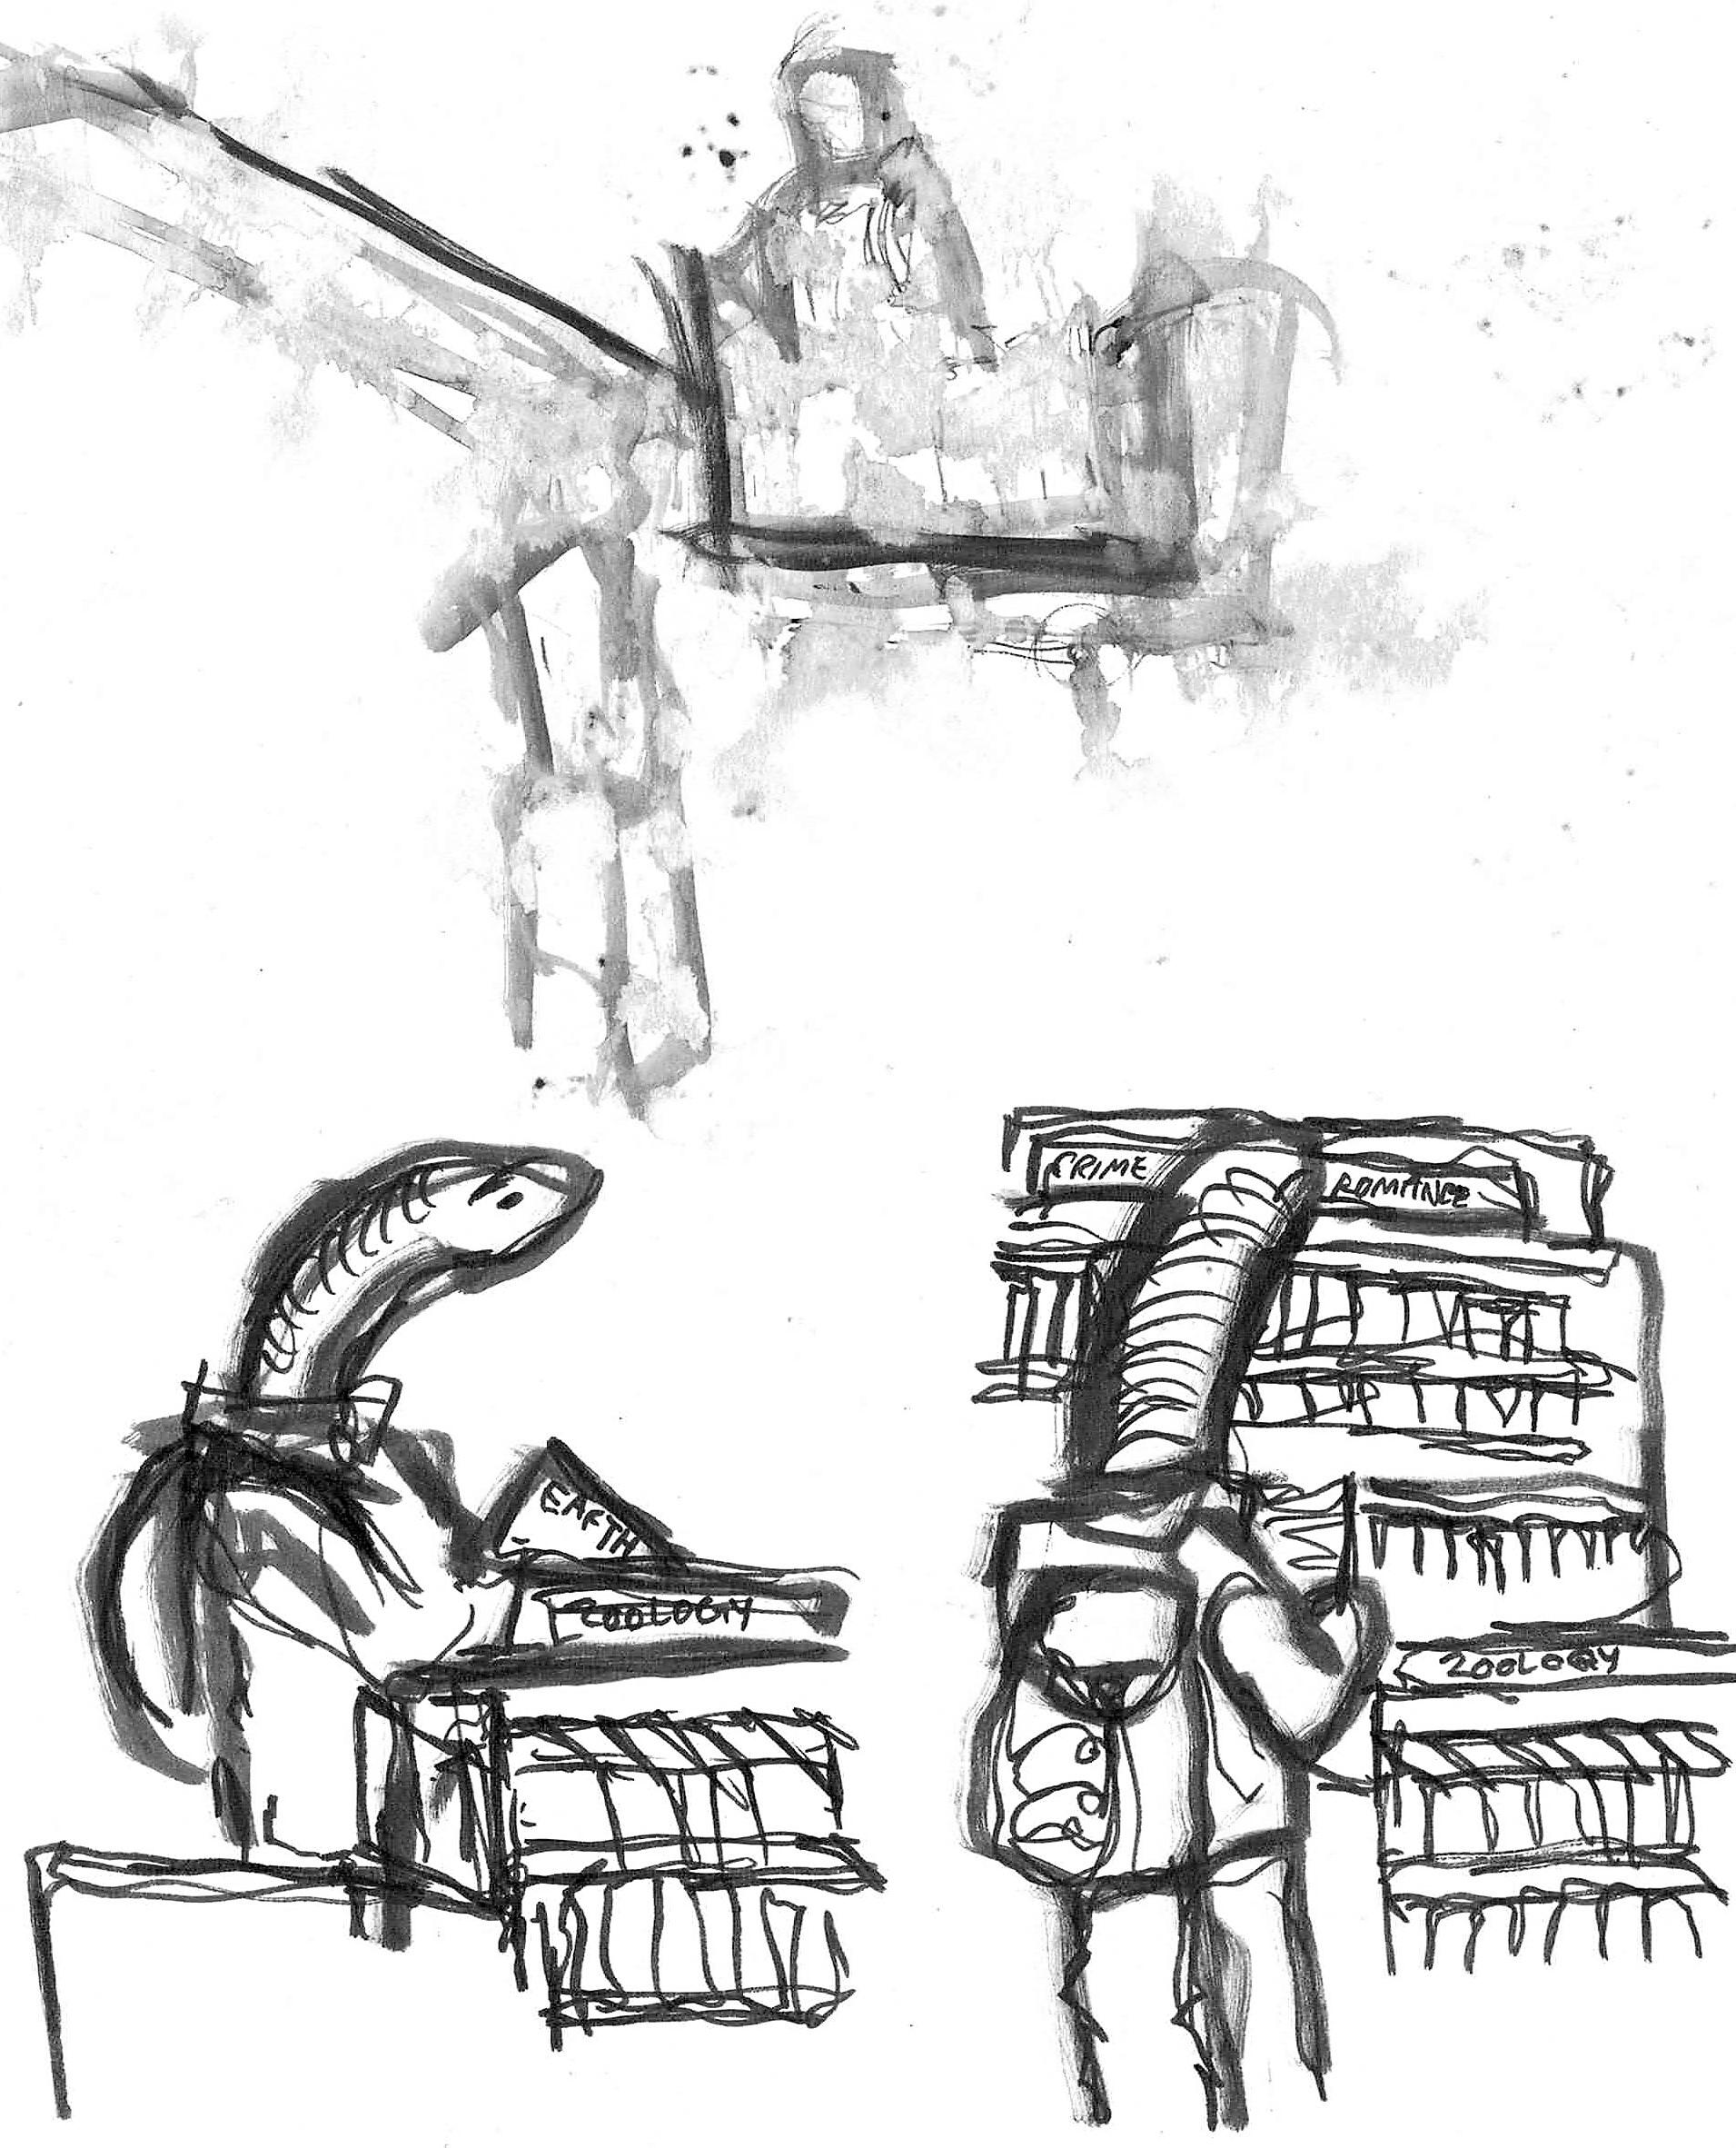 Bookworm and fireman